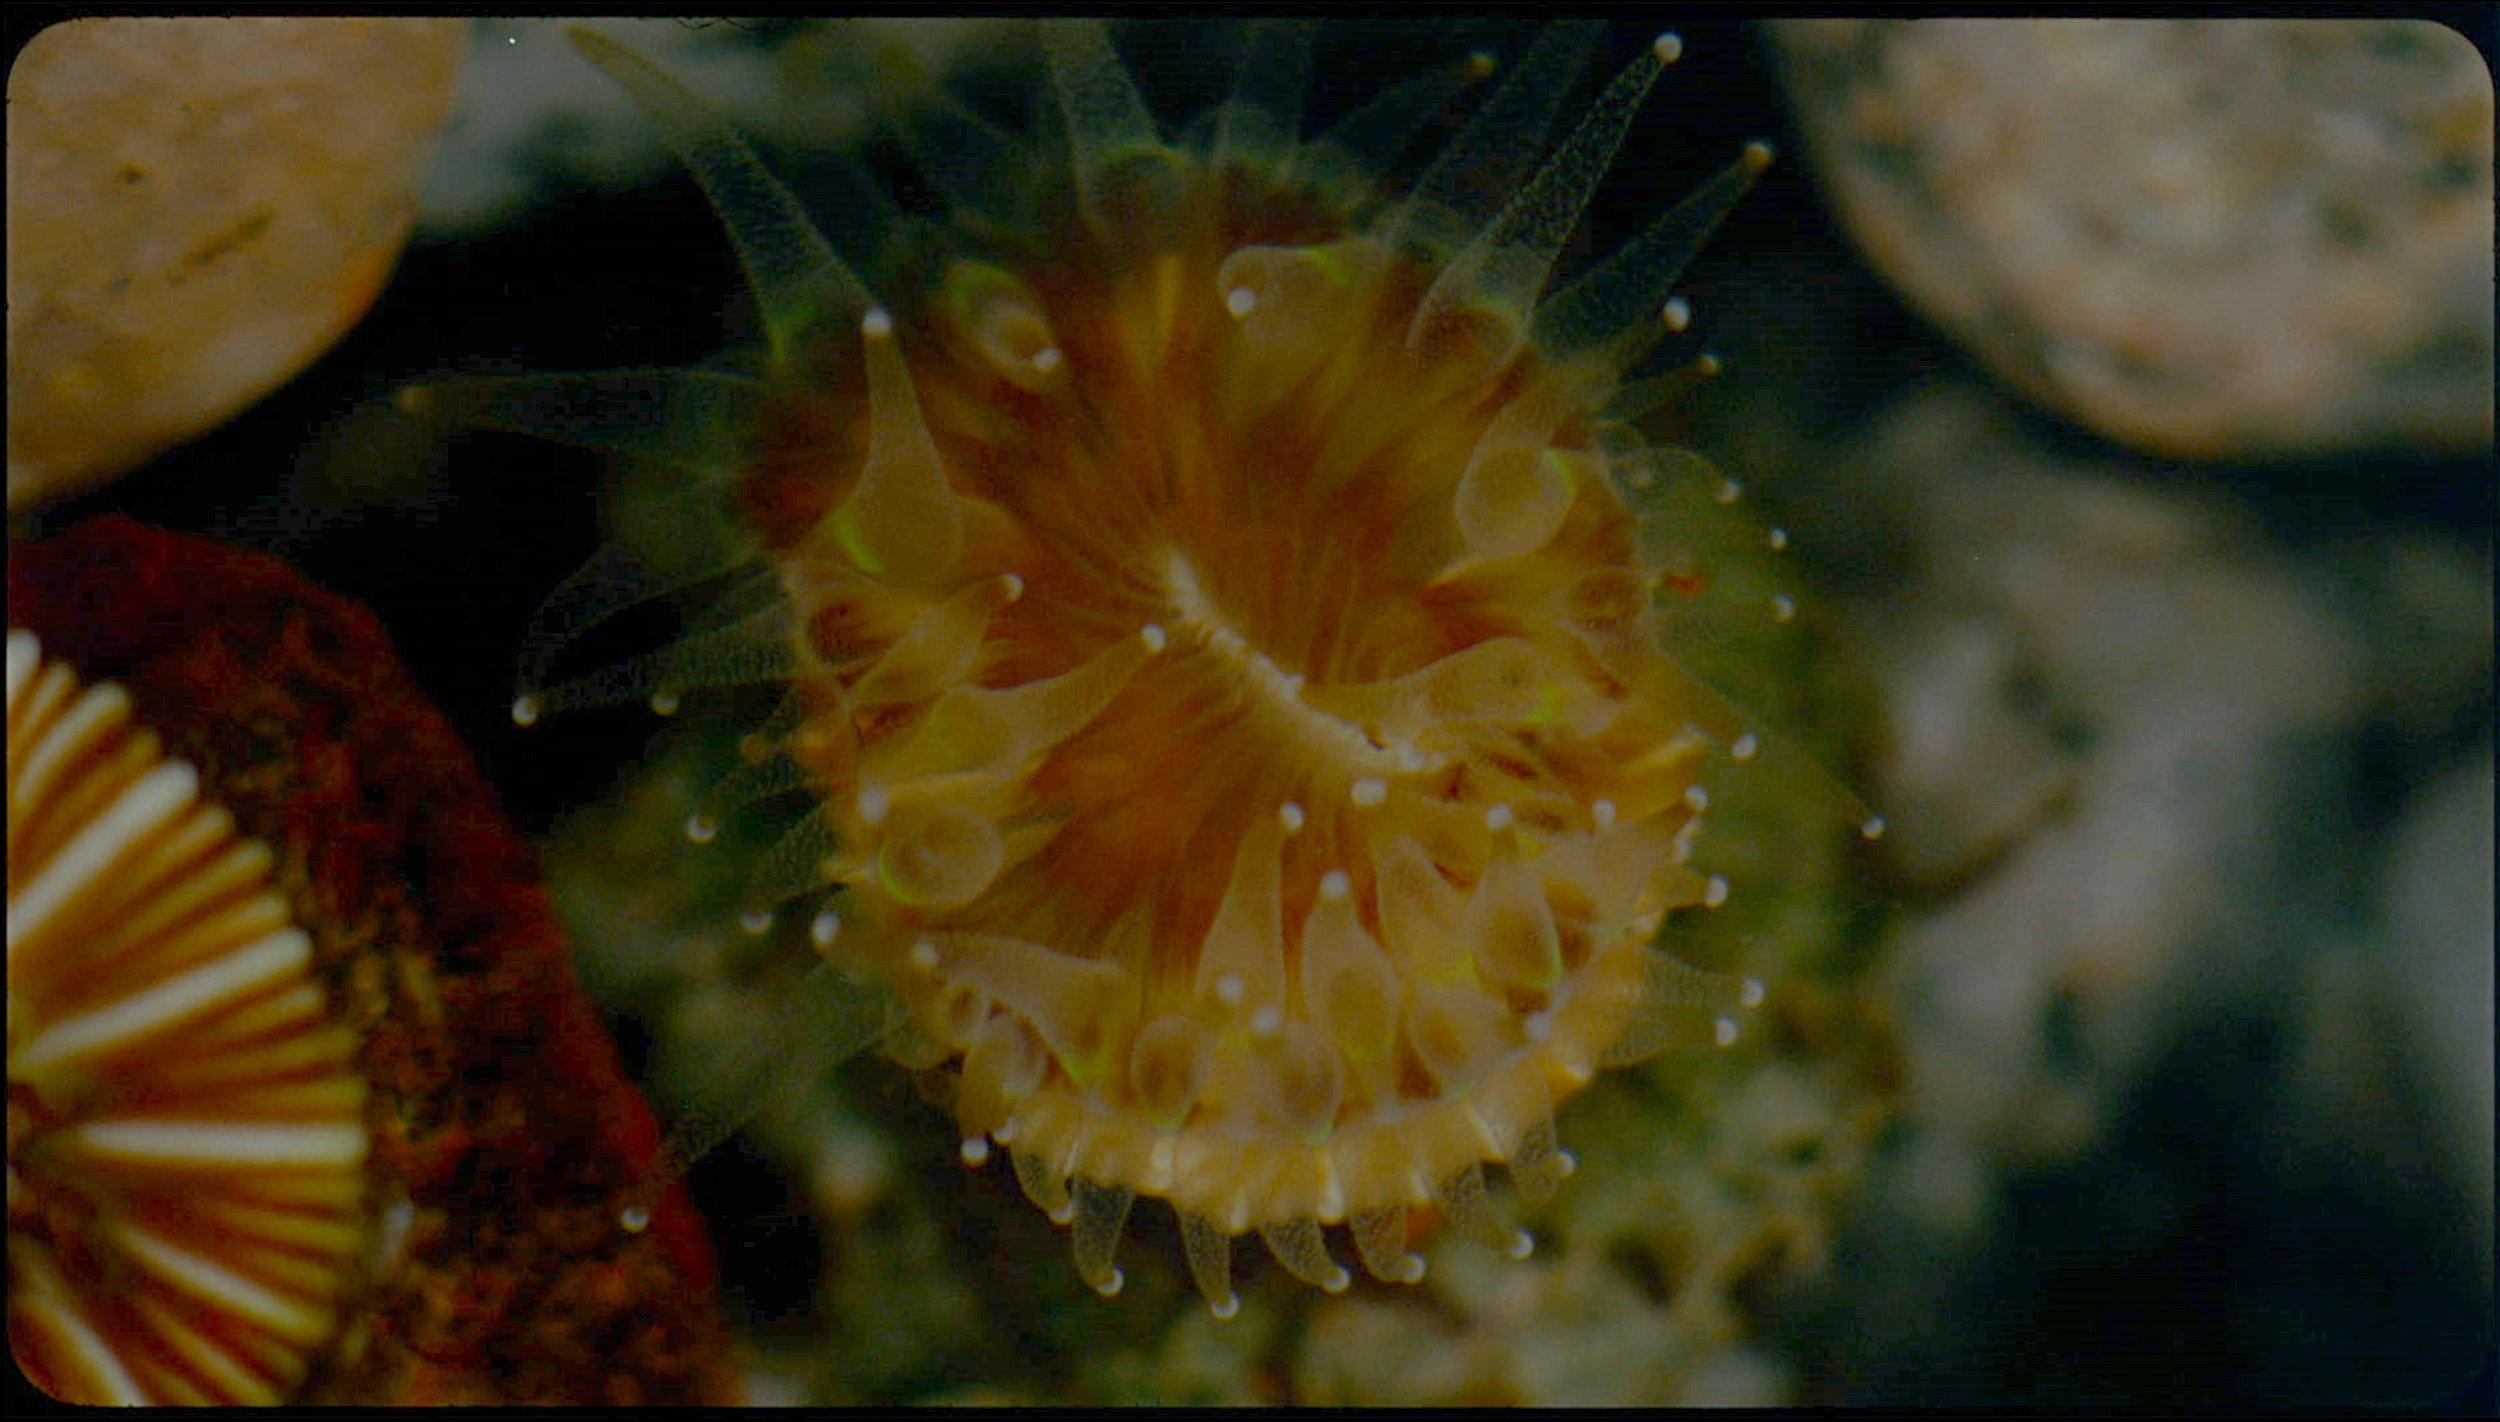 Cup Coral, 'Cladach' film still CREDIT Margaret Salmon 2018 .jpg